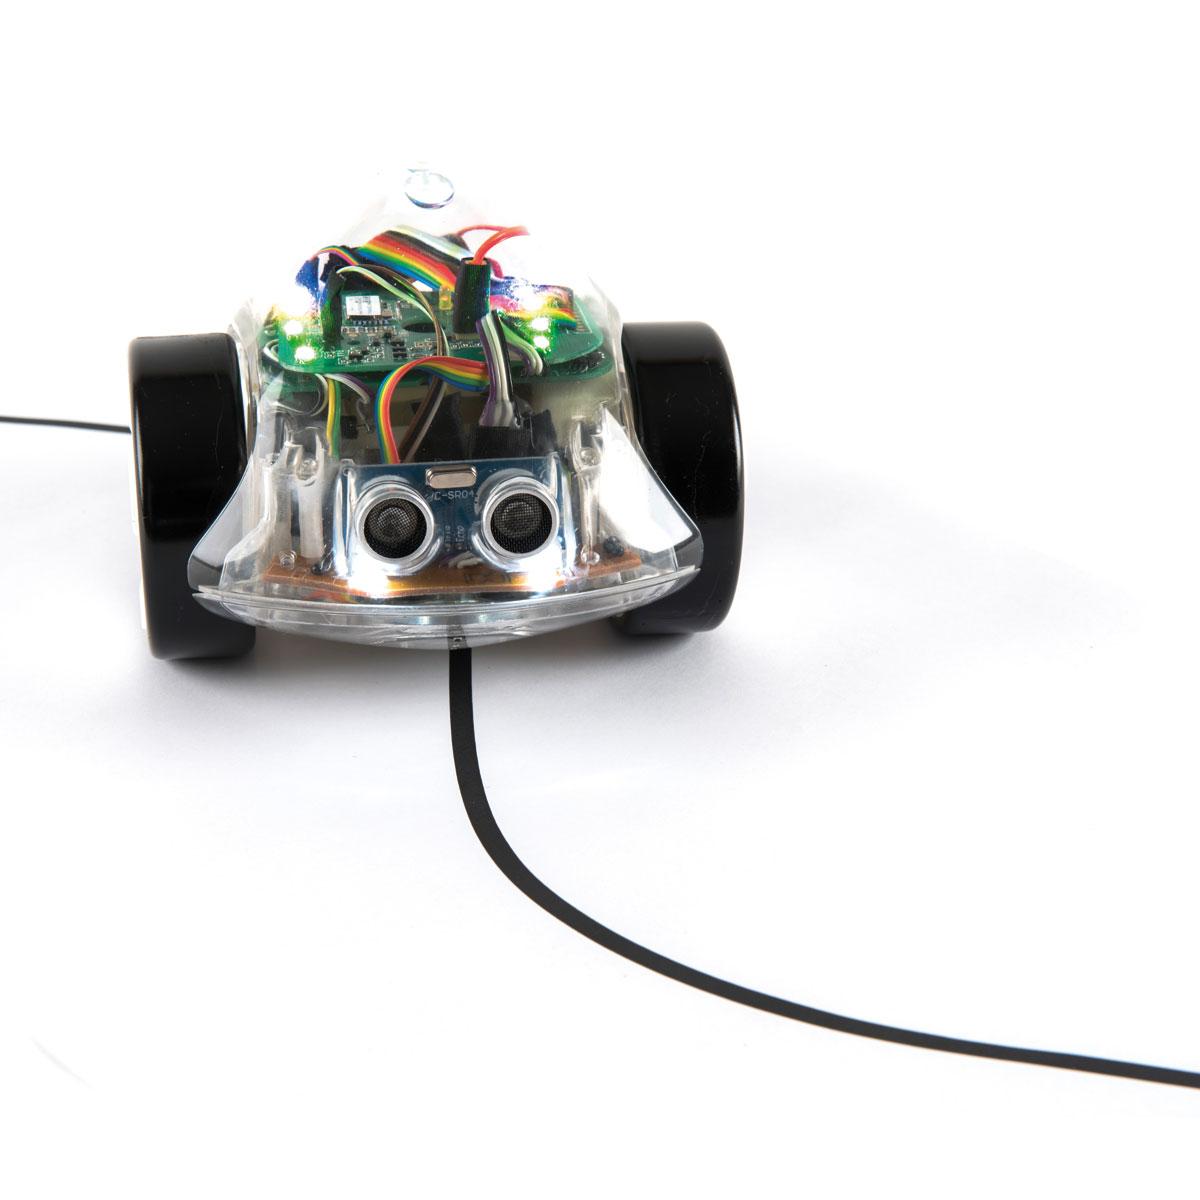 Tts Ino Bot Scratch Programmable Bluetooth Floor Robot